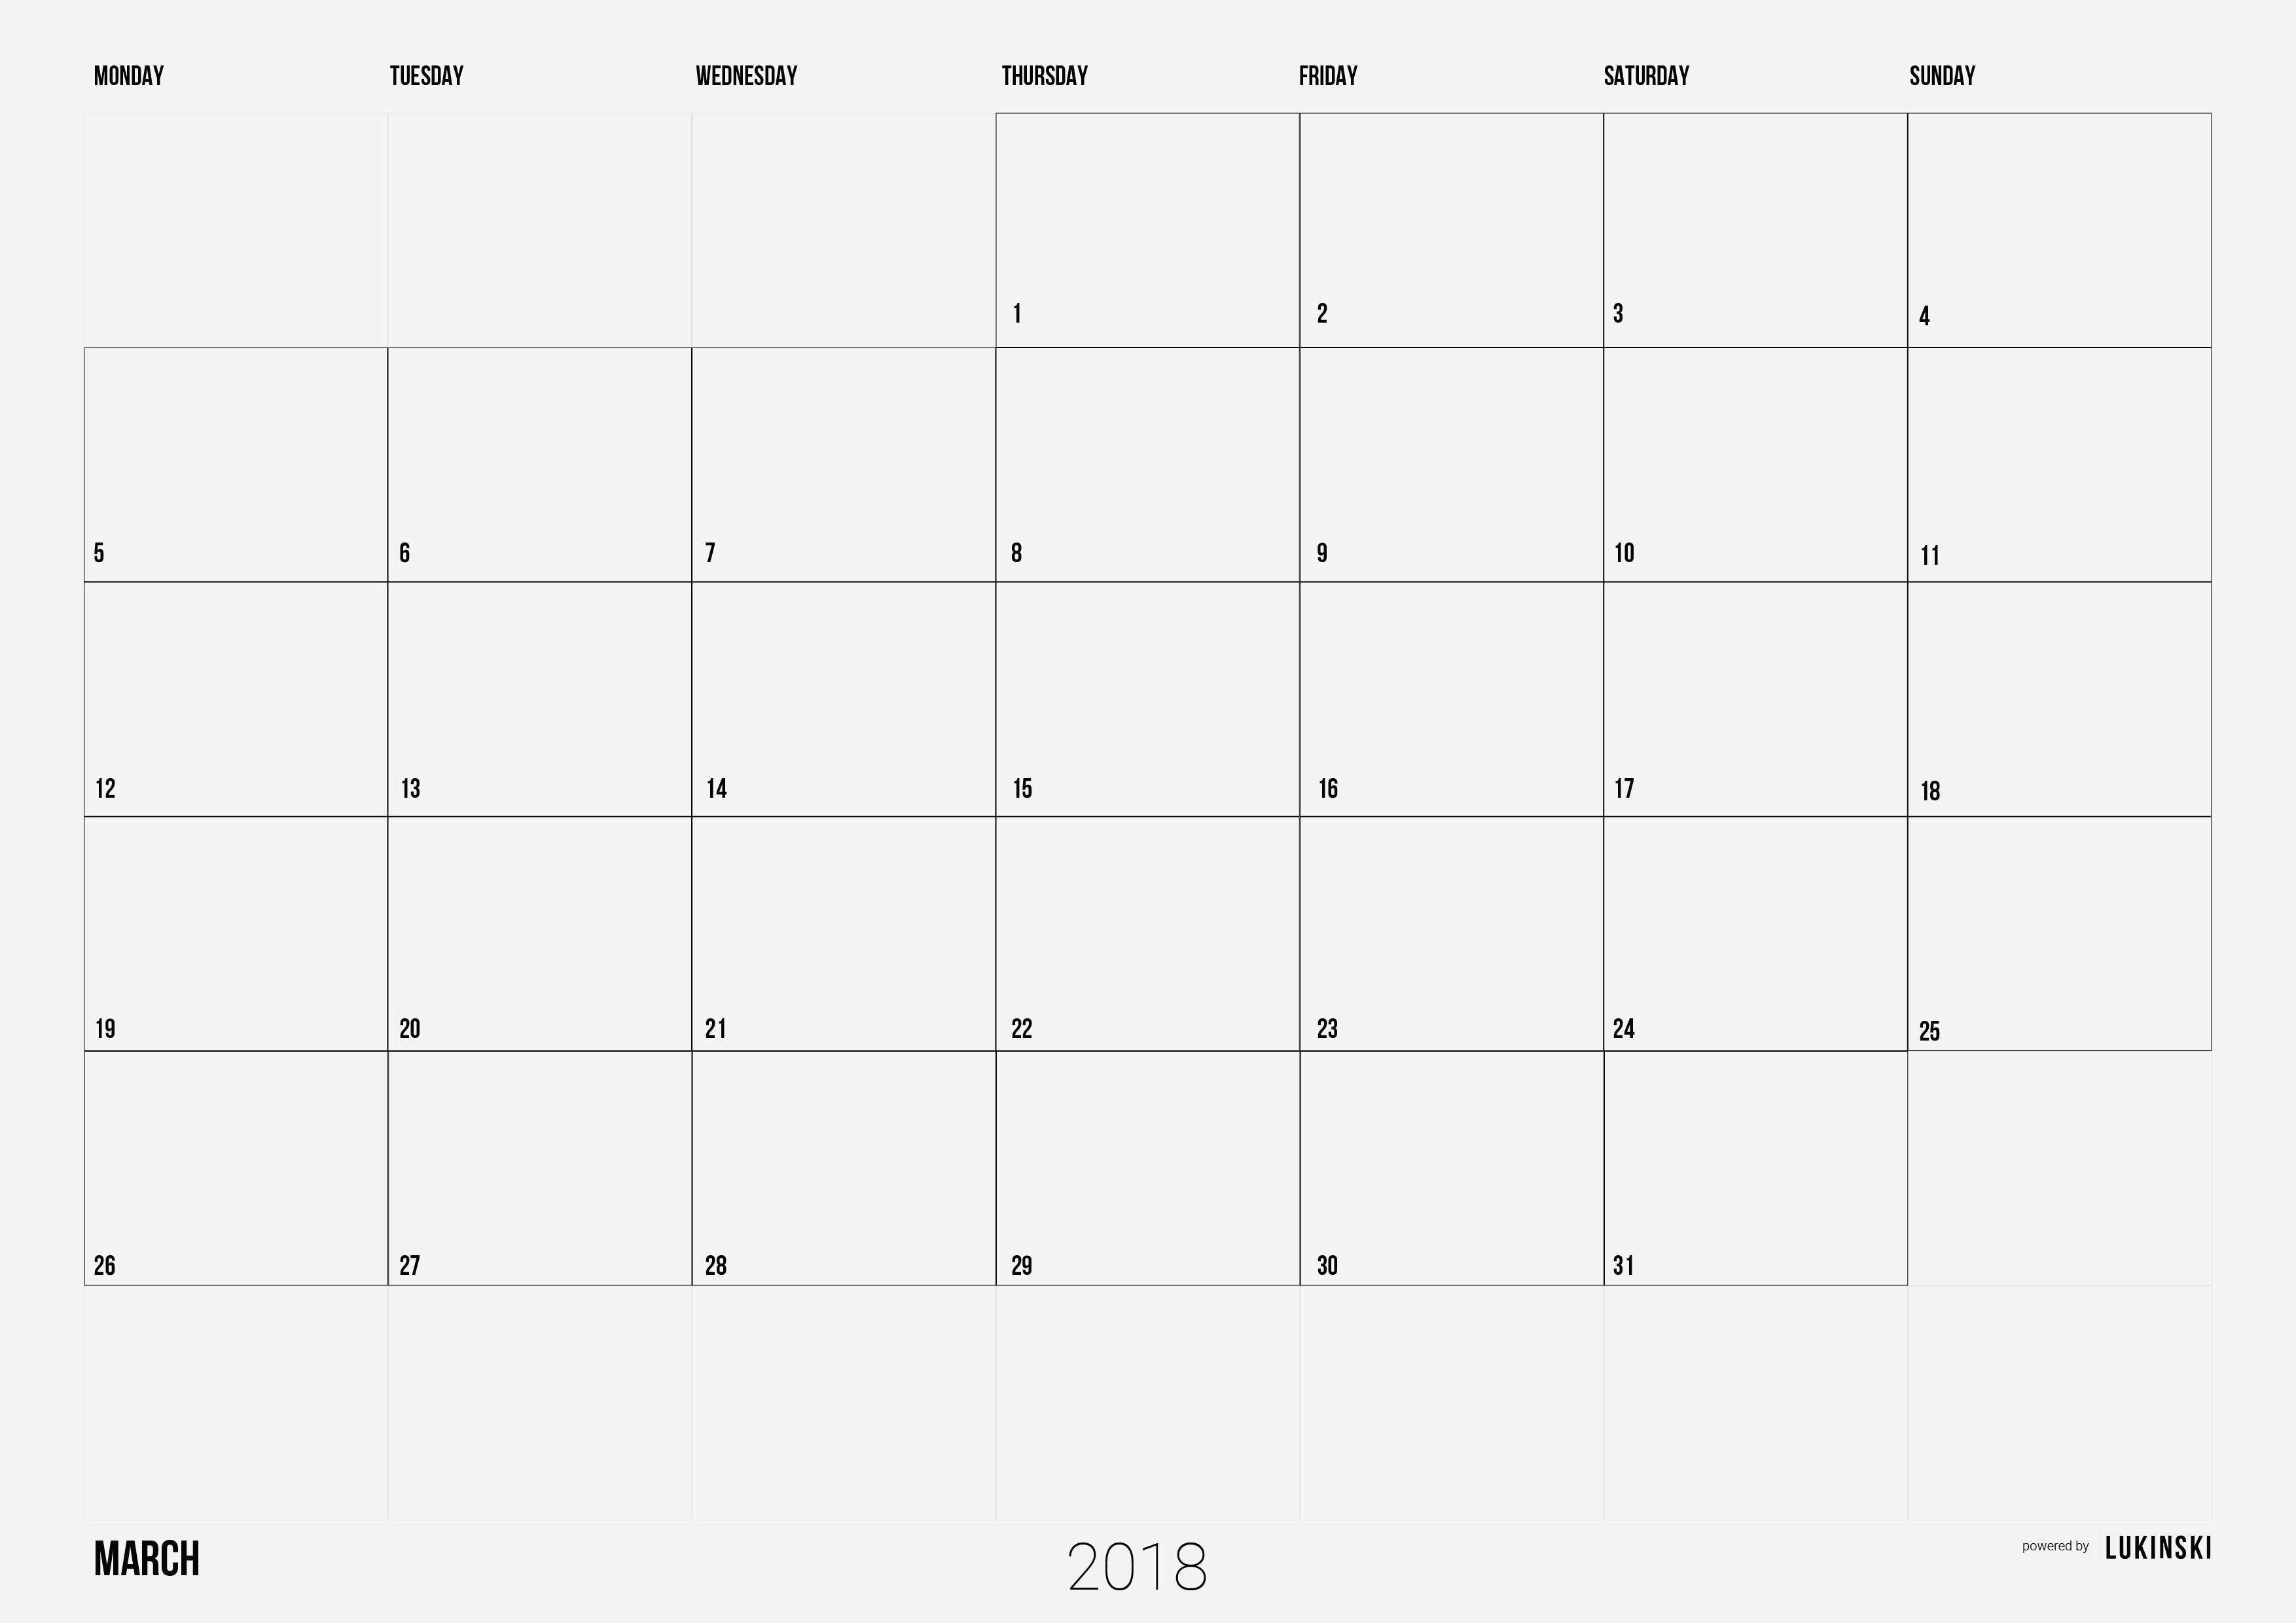 Adobe Photoshop Calendar Template Check More At Https